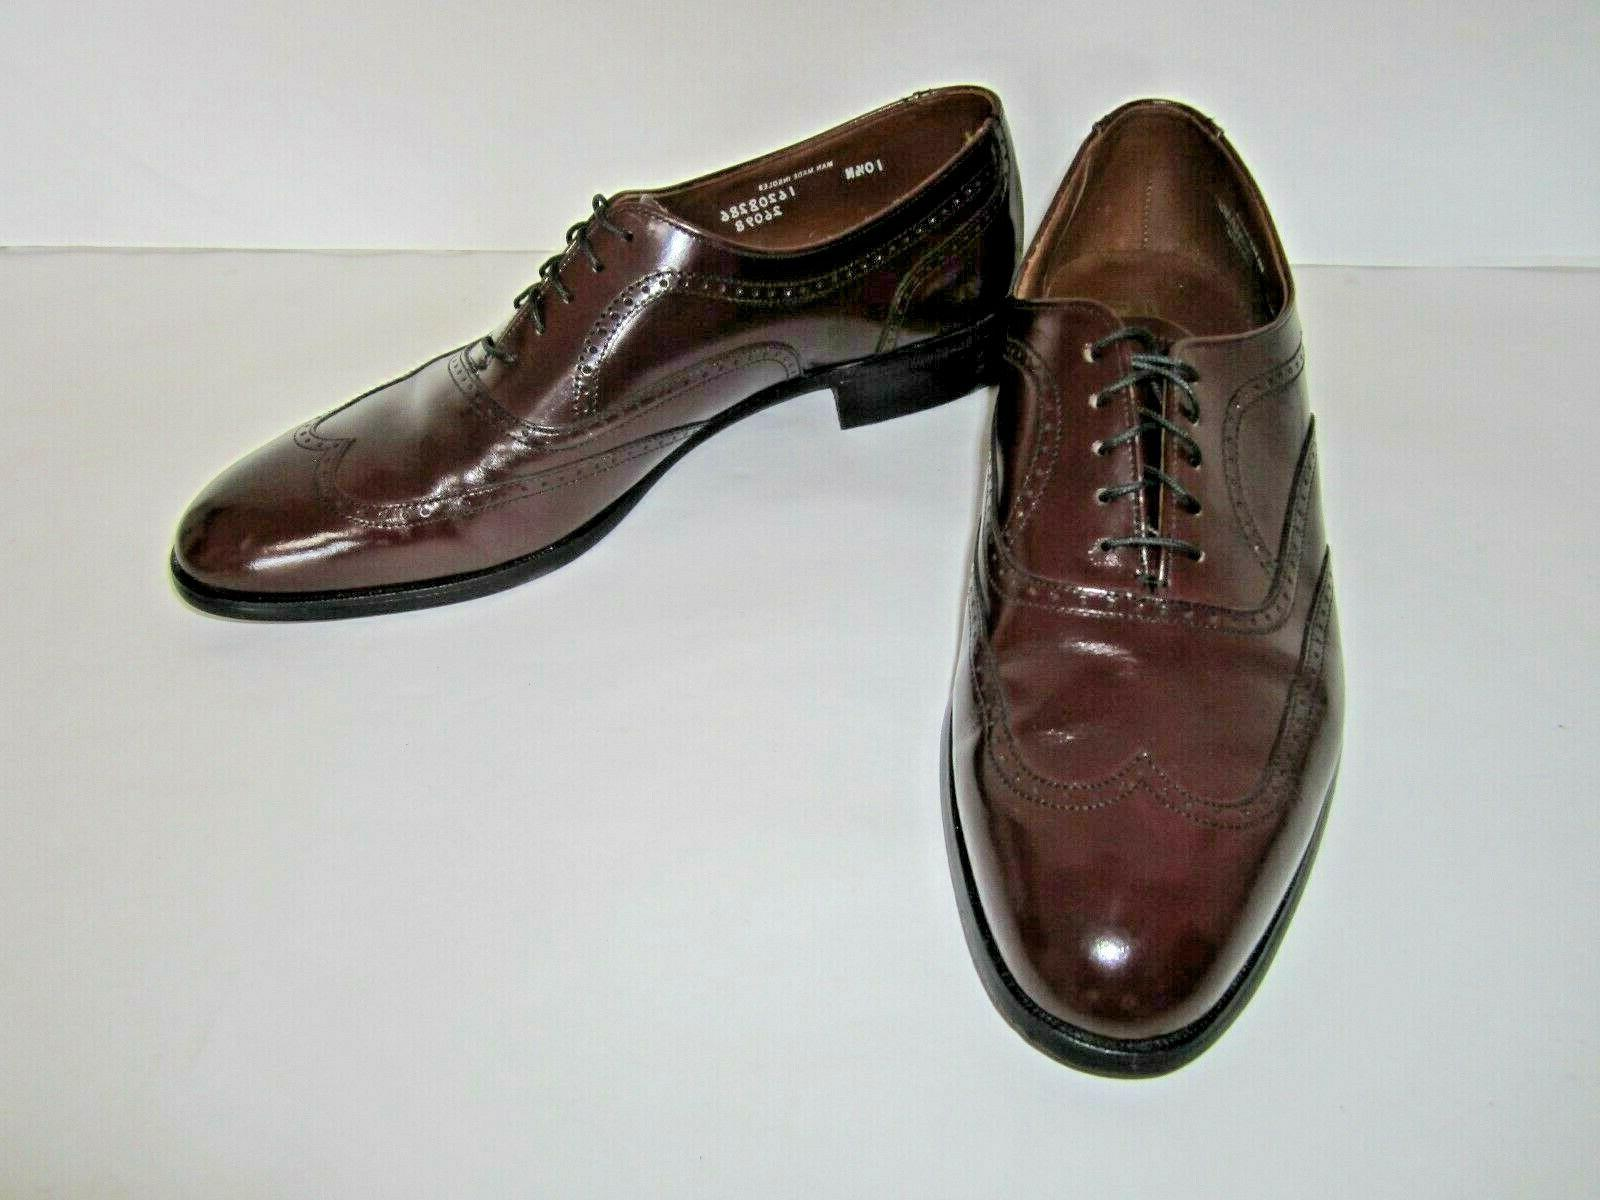 leather mens burgundy wingtip oxford shoes sz